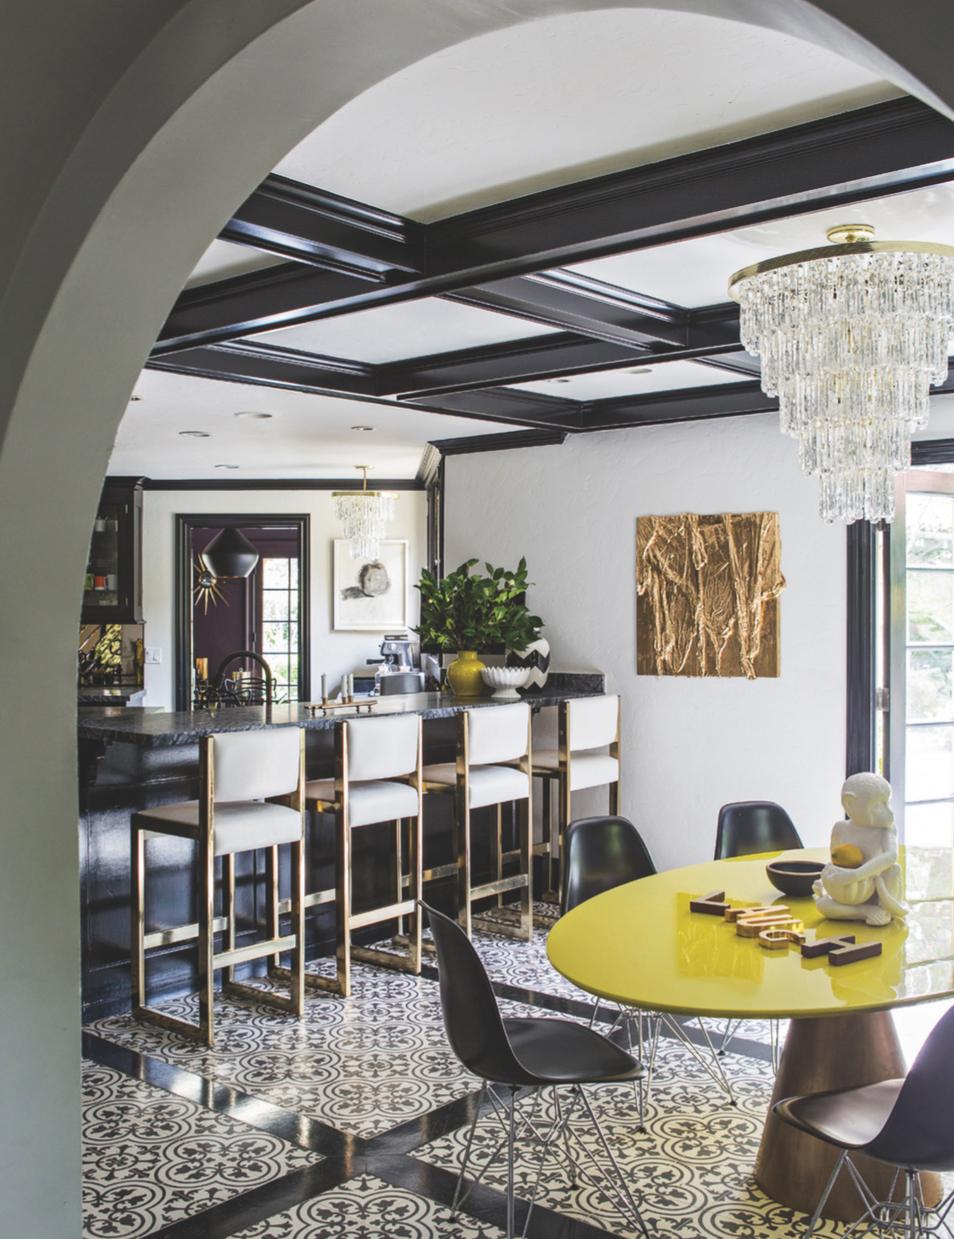 The Everlasting Elegance of Granada Tile - Granada Tile ...